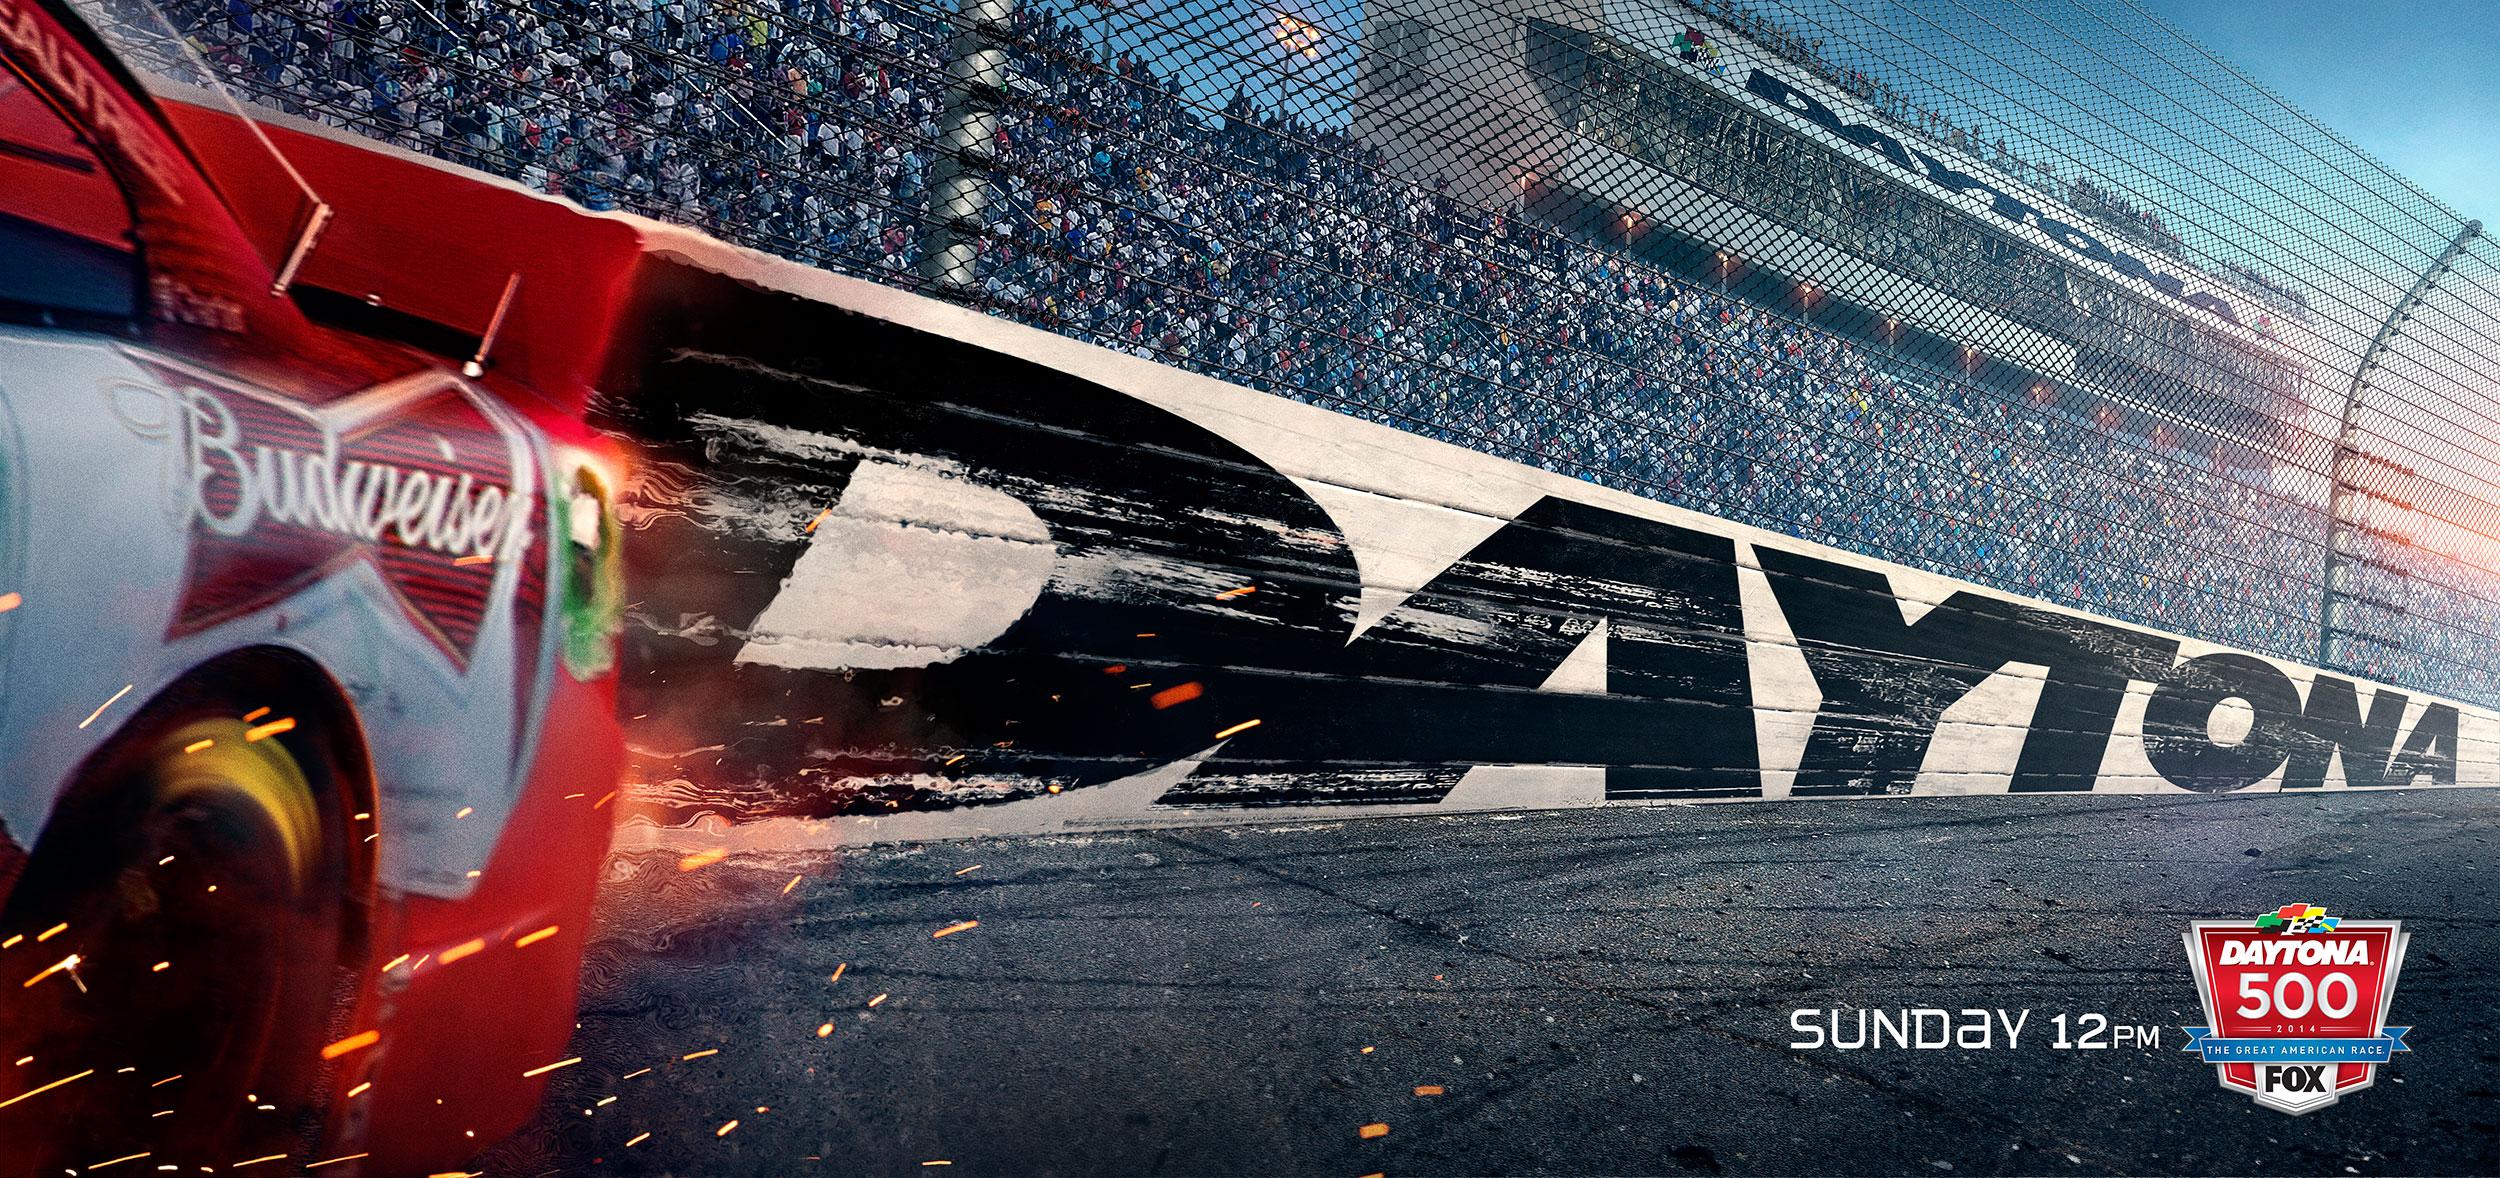 Fox Sports | Daytona 500 Key Art